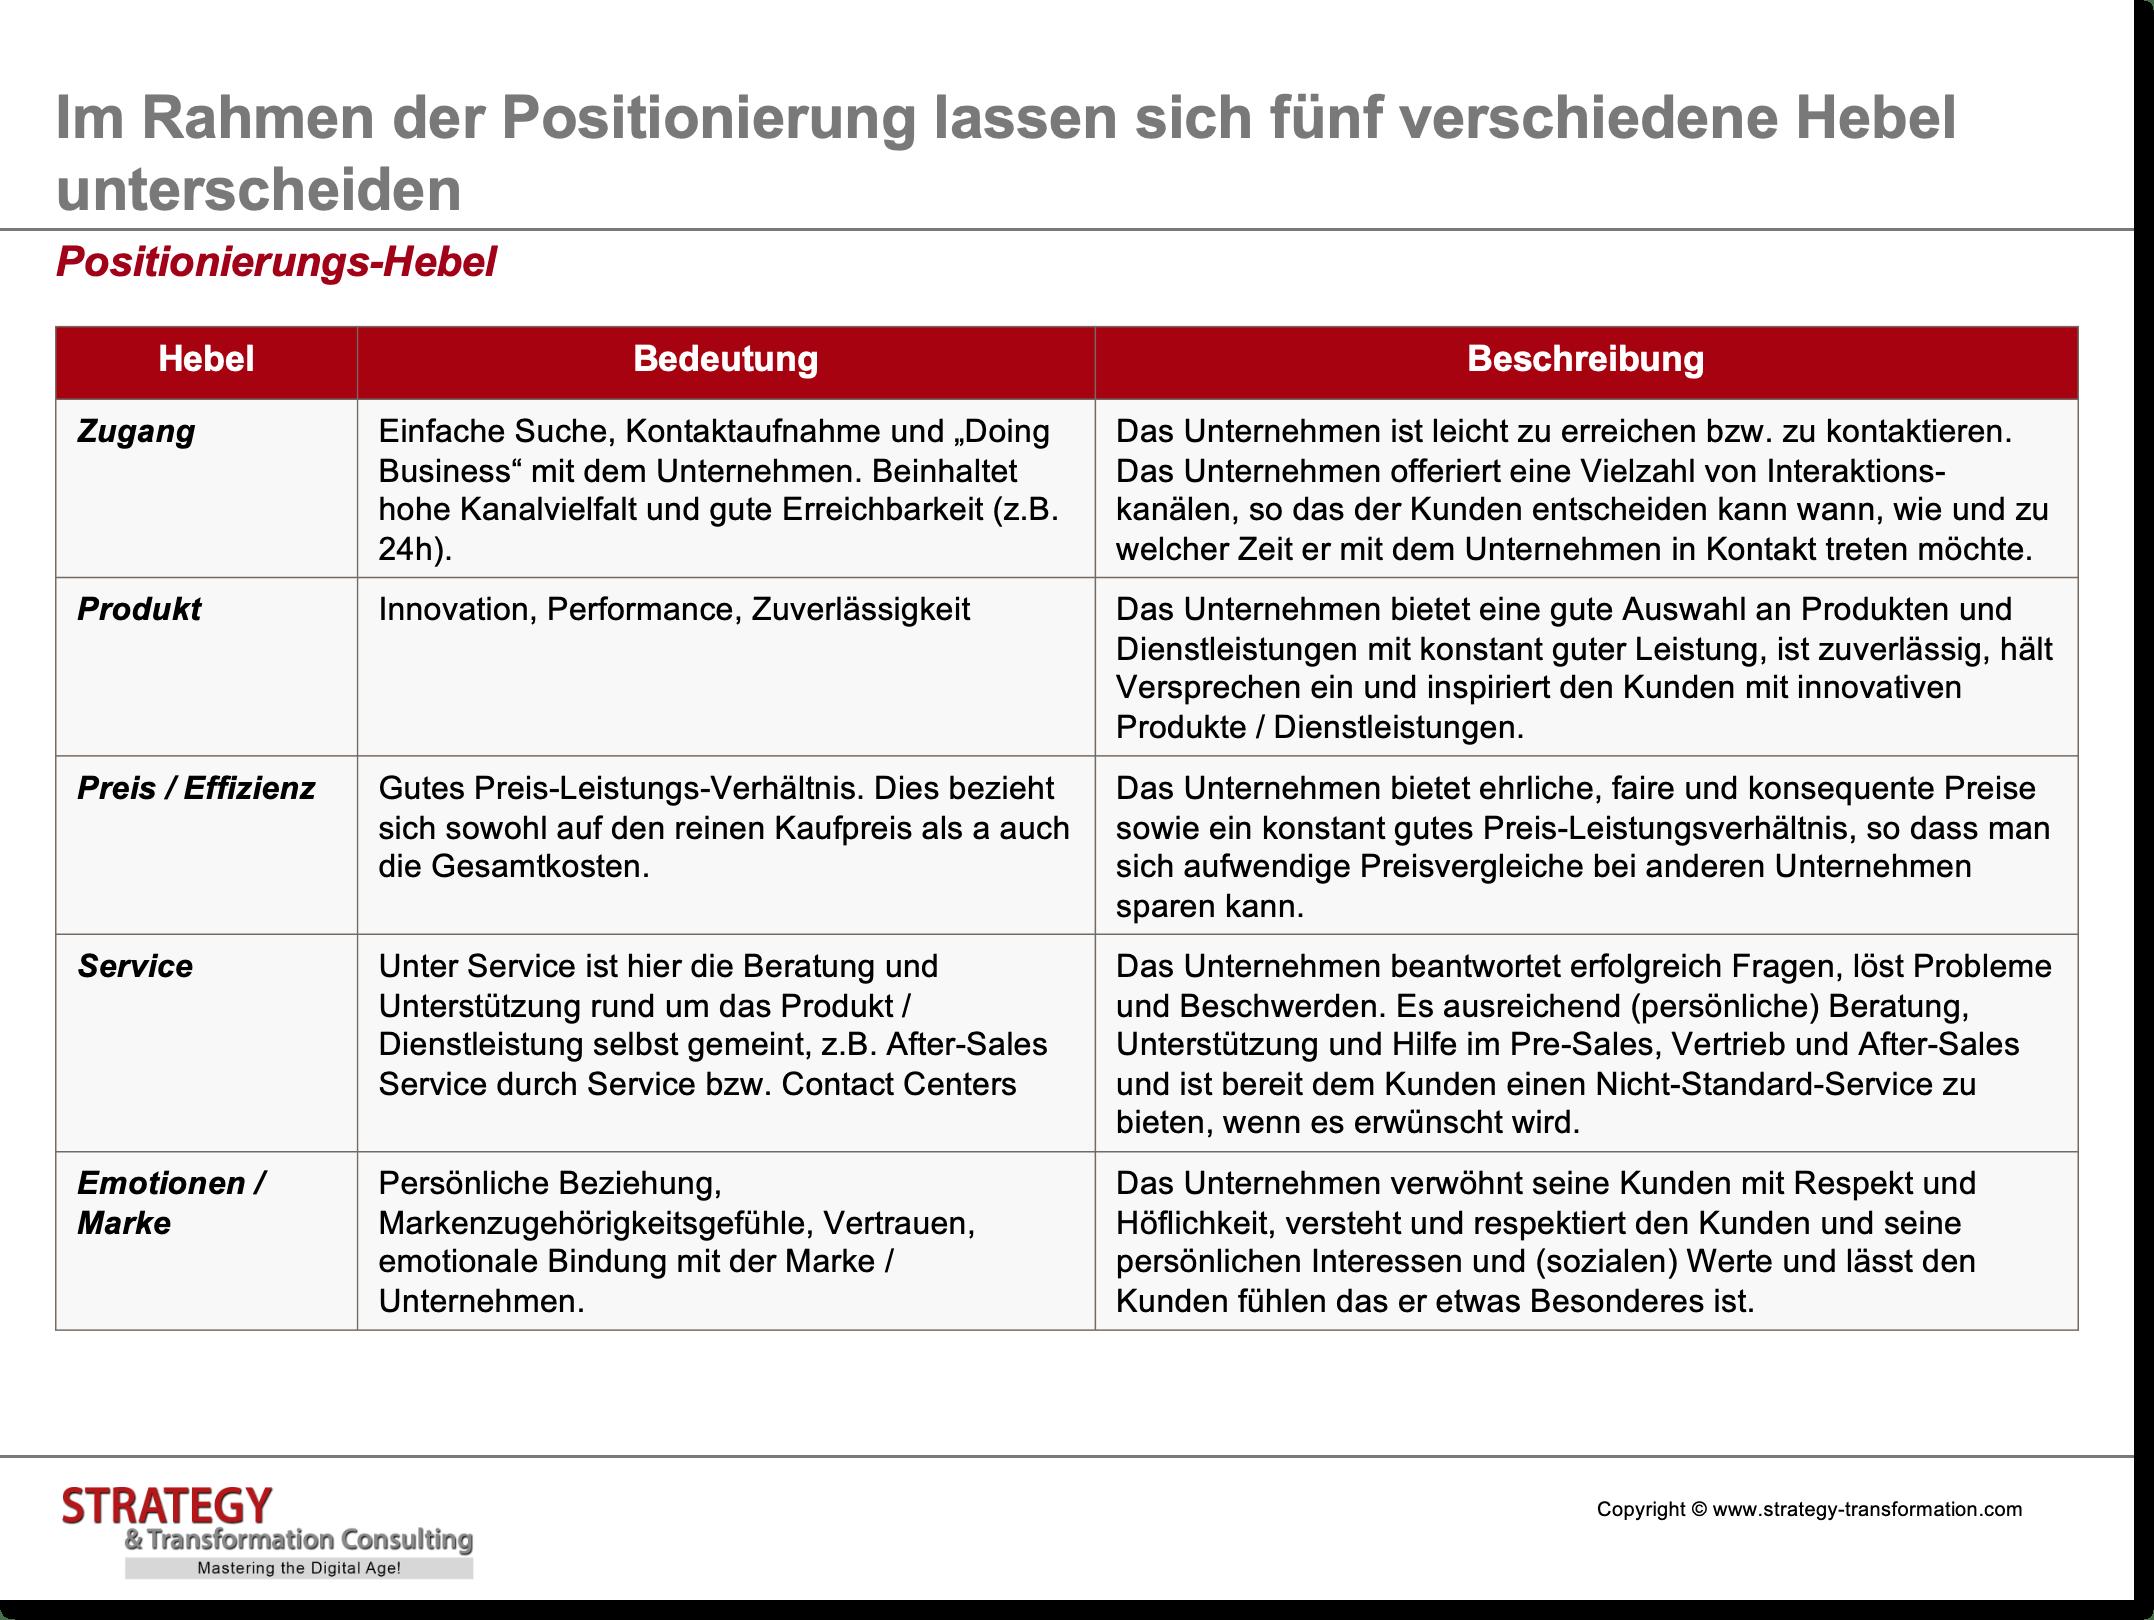 Customer Experience Management_Positionierungs-Hebel